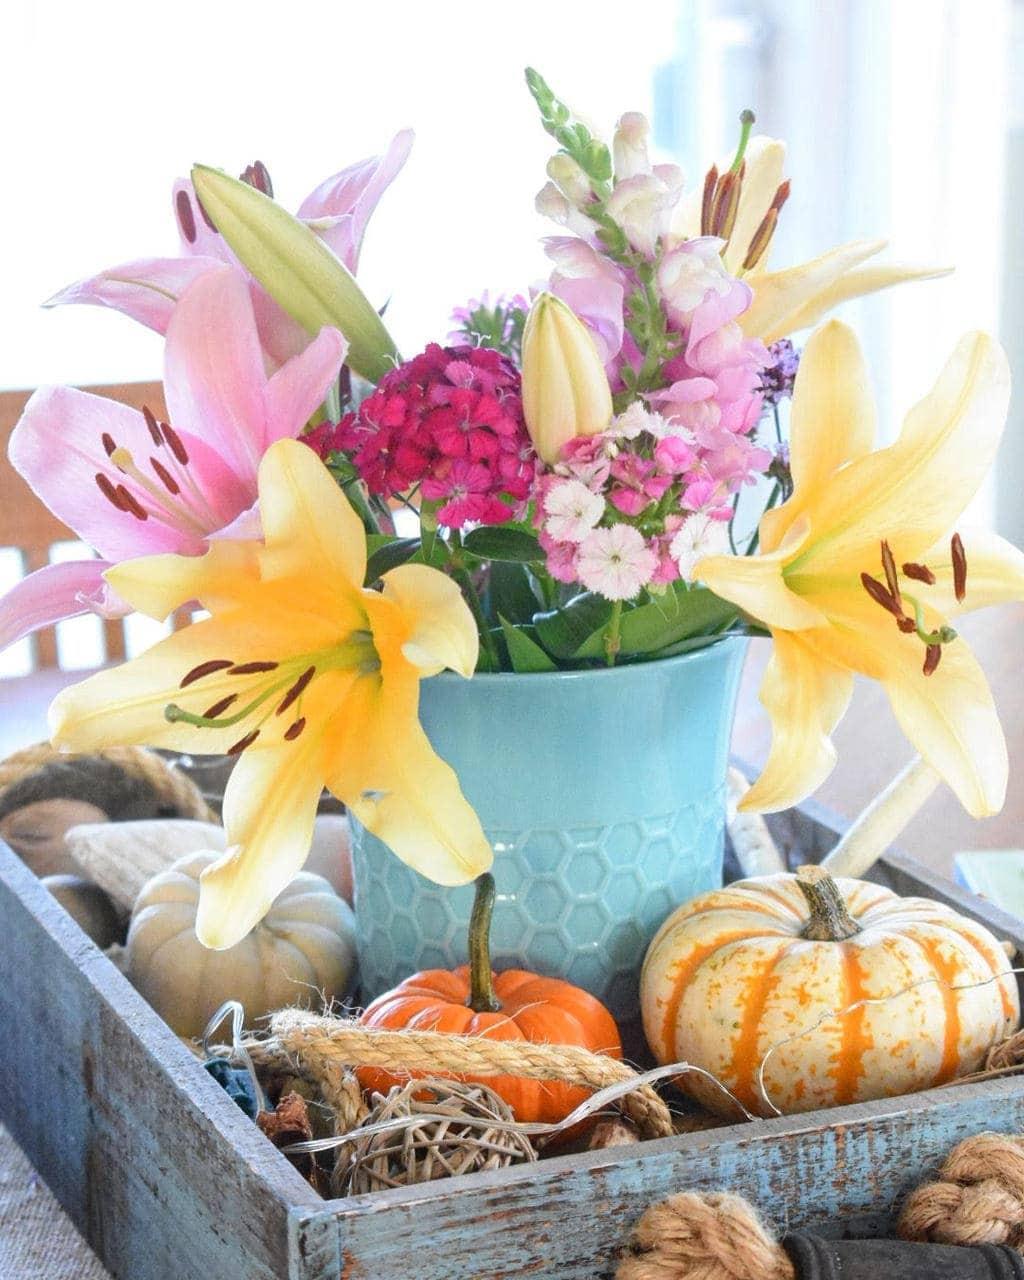 Flowers with decorative pumpkins